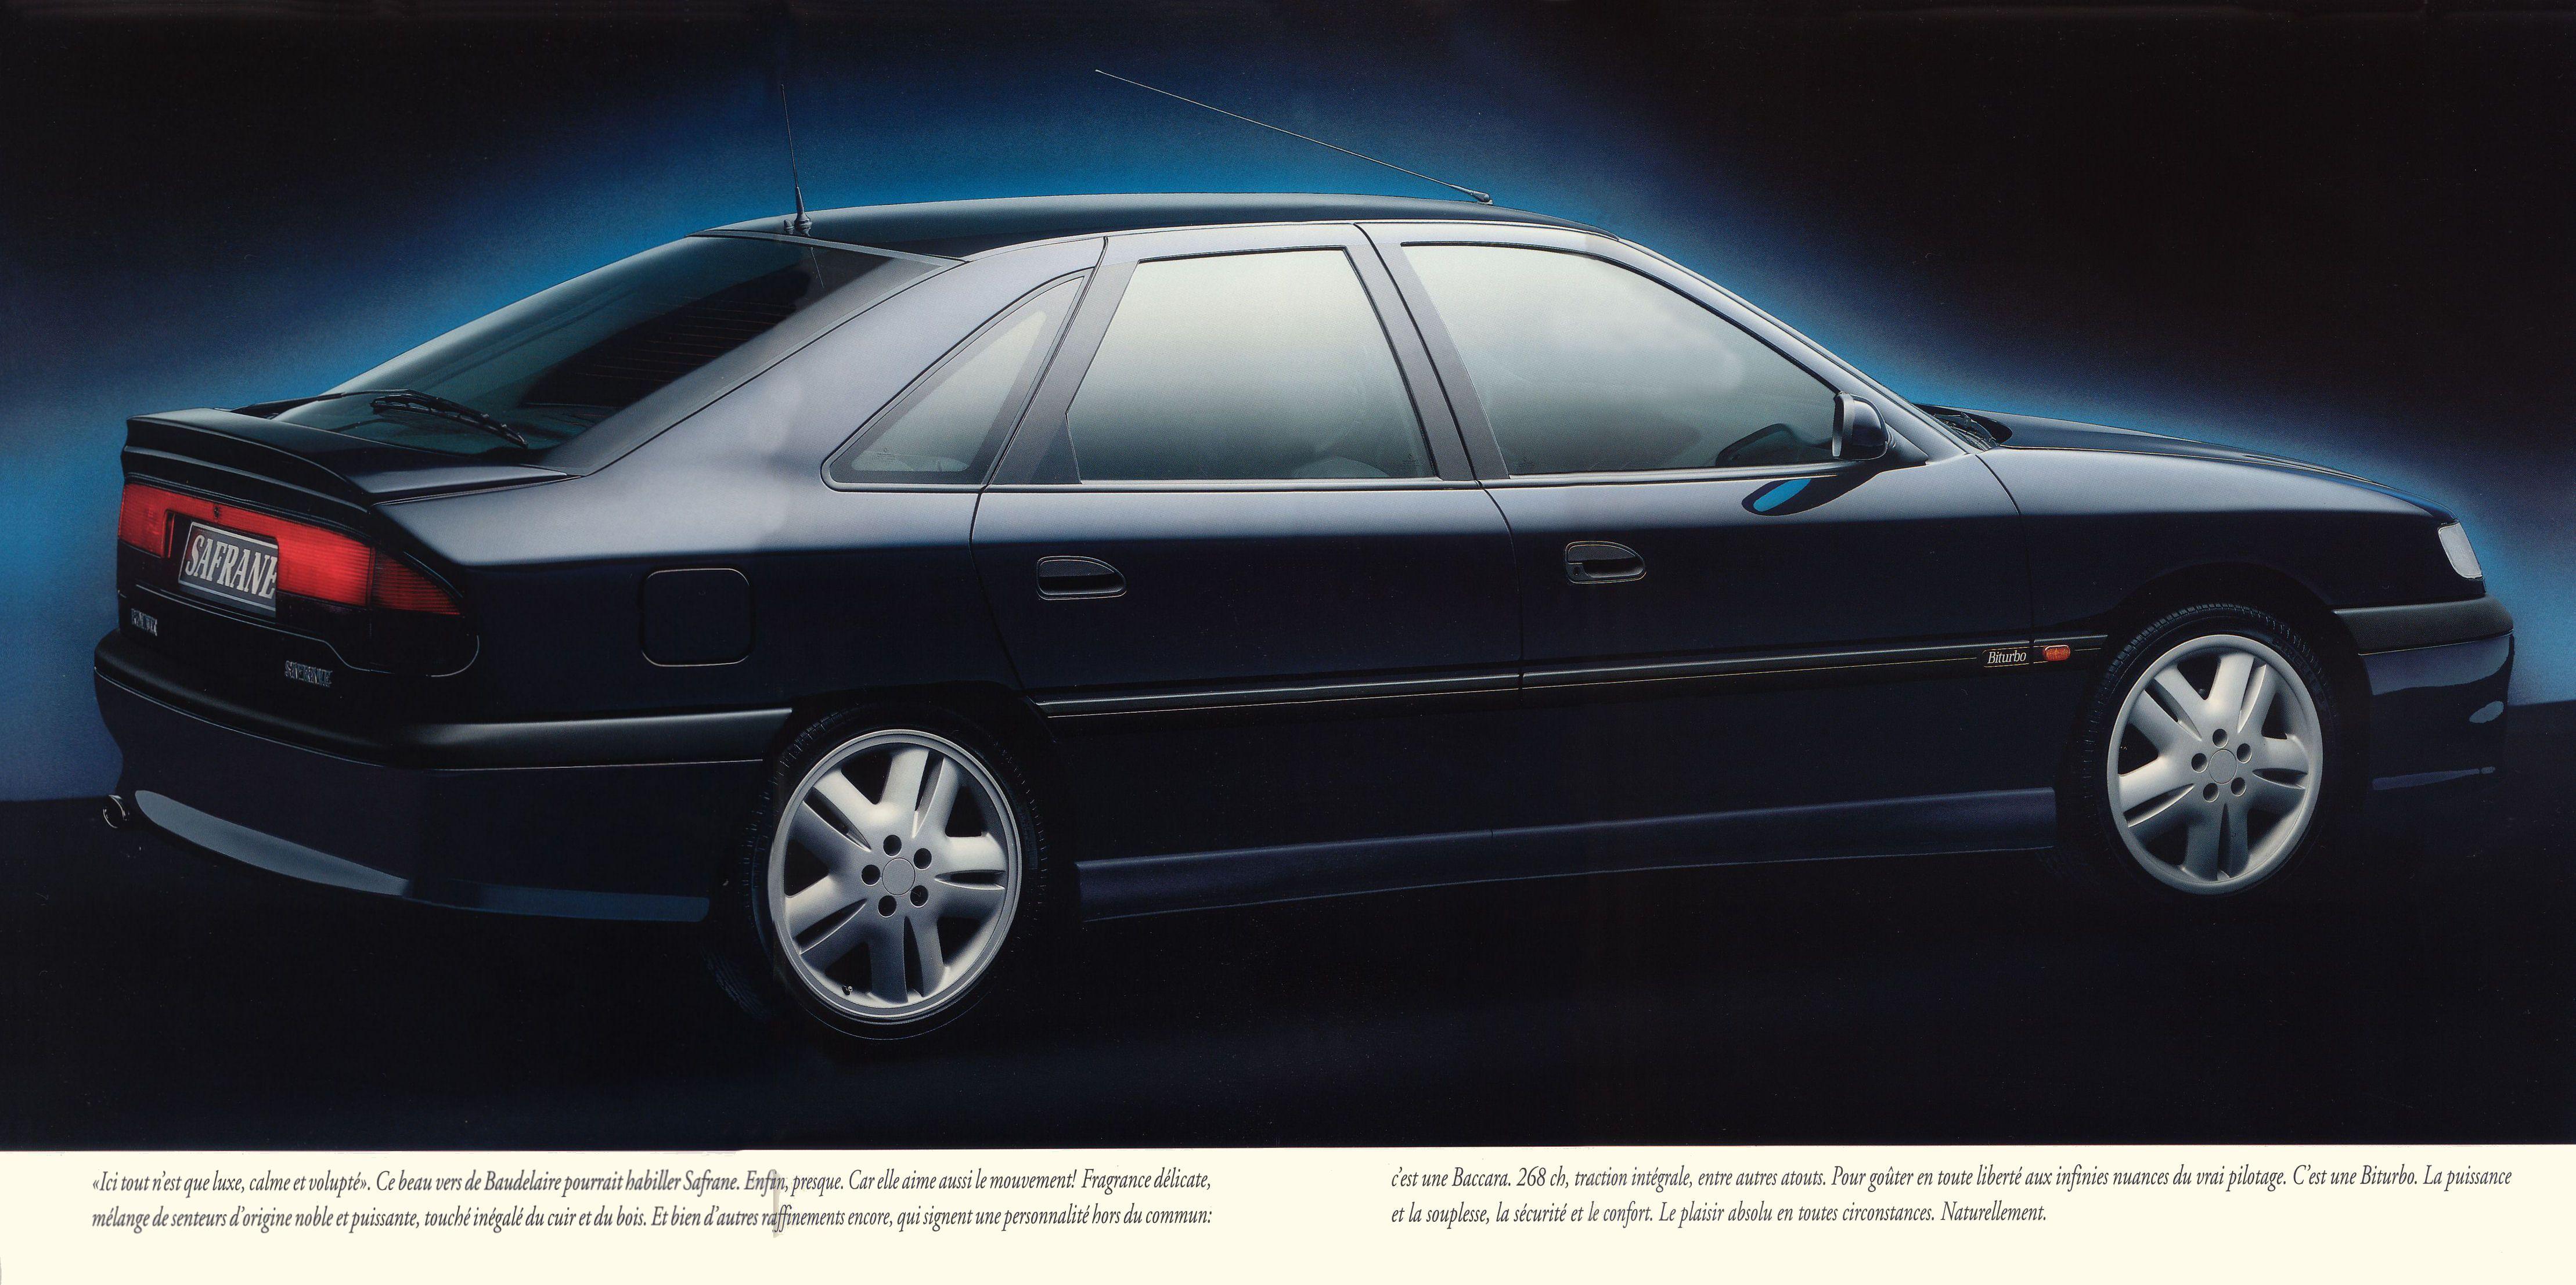 1993 Renault Safrane Bi Turbo Brochure